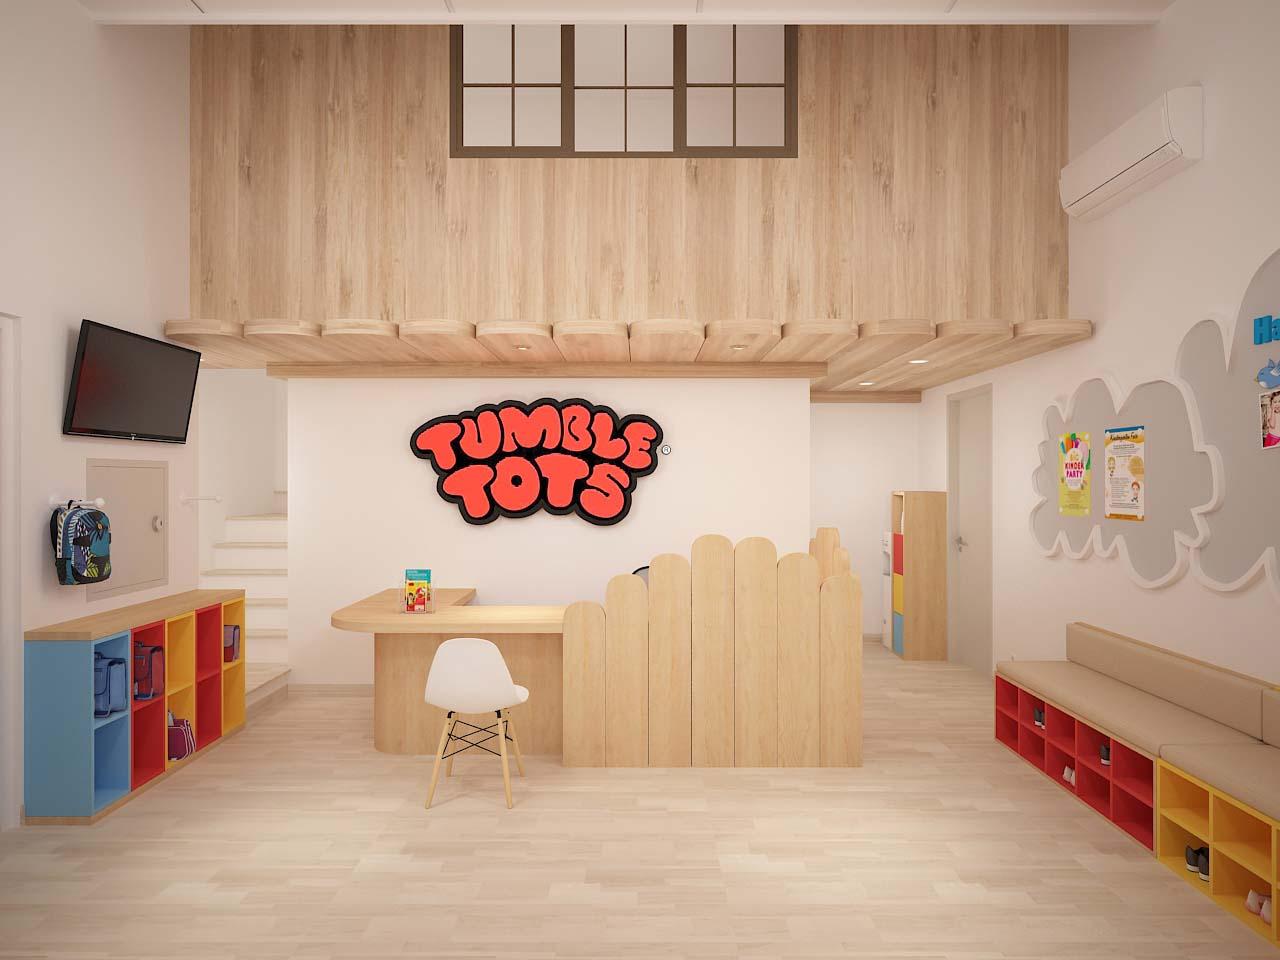 Tumble-Tots-Lobby_4.jpg